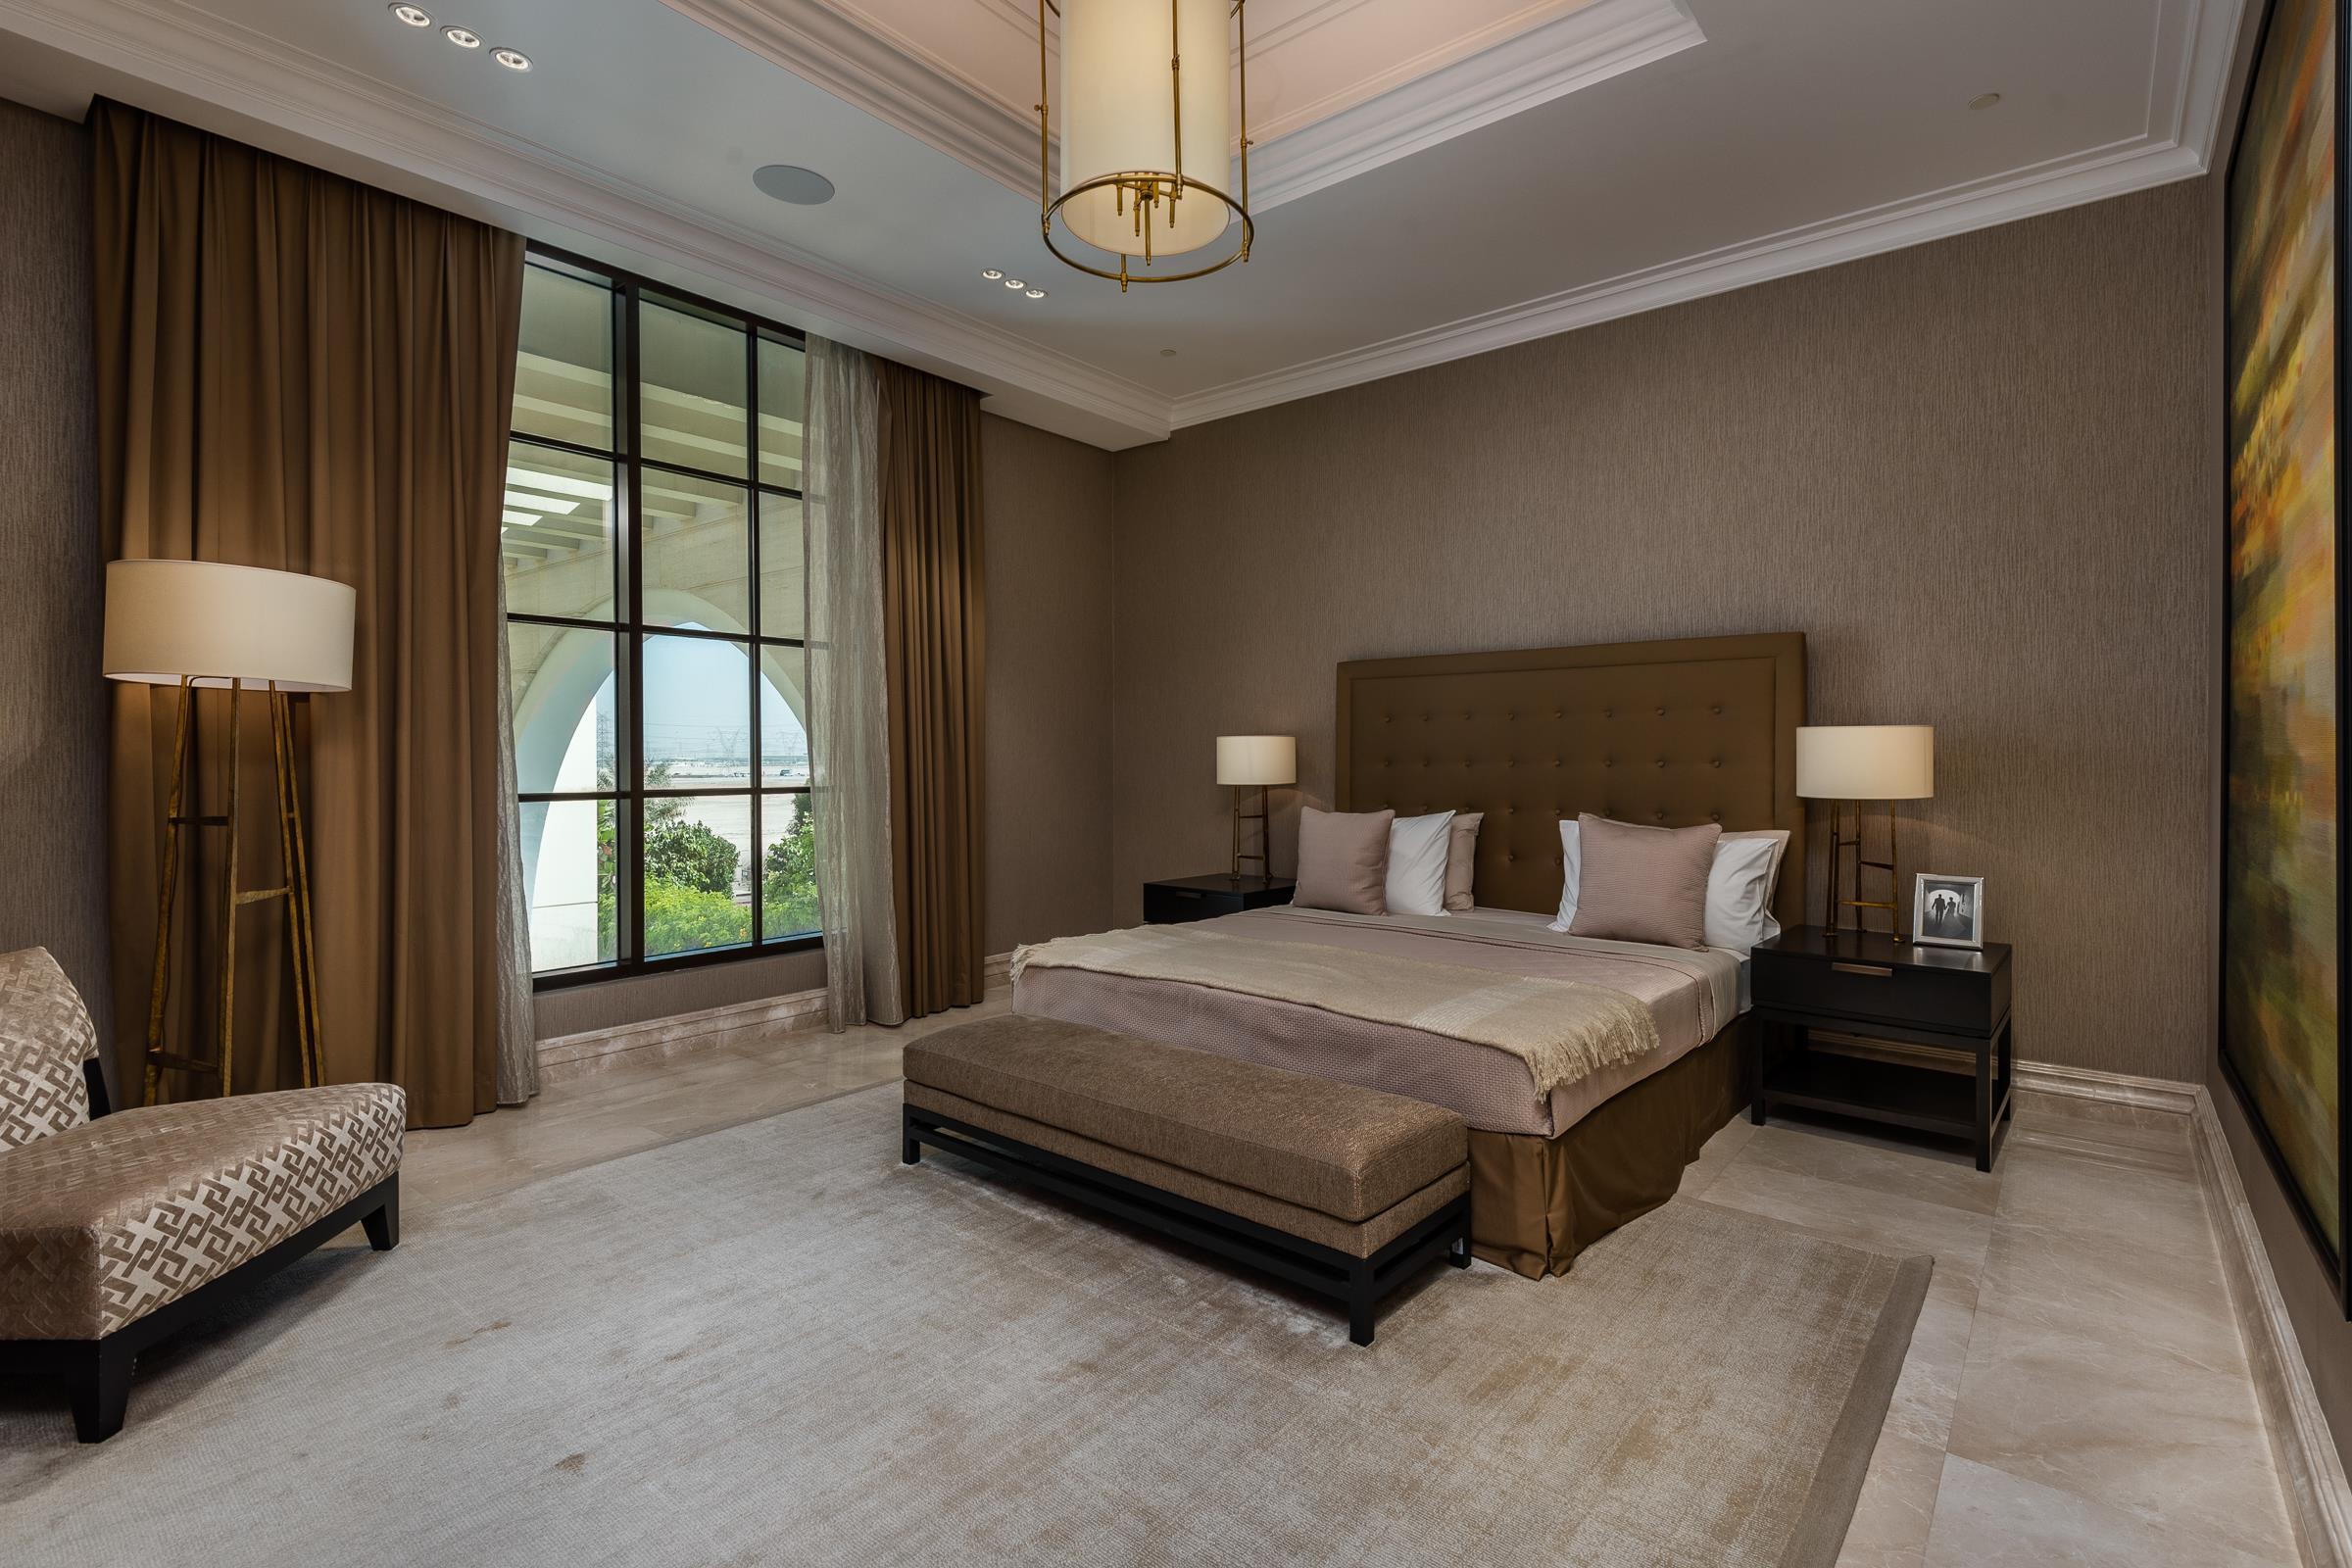 7 Bedroom Mansion on the Crystal Lagoon